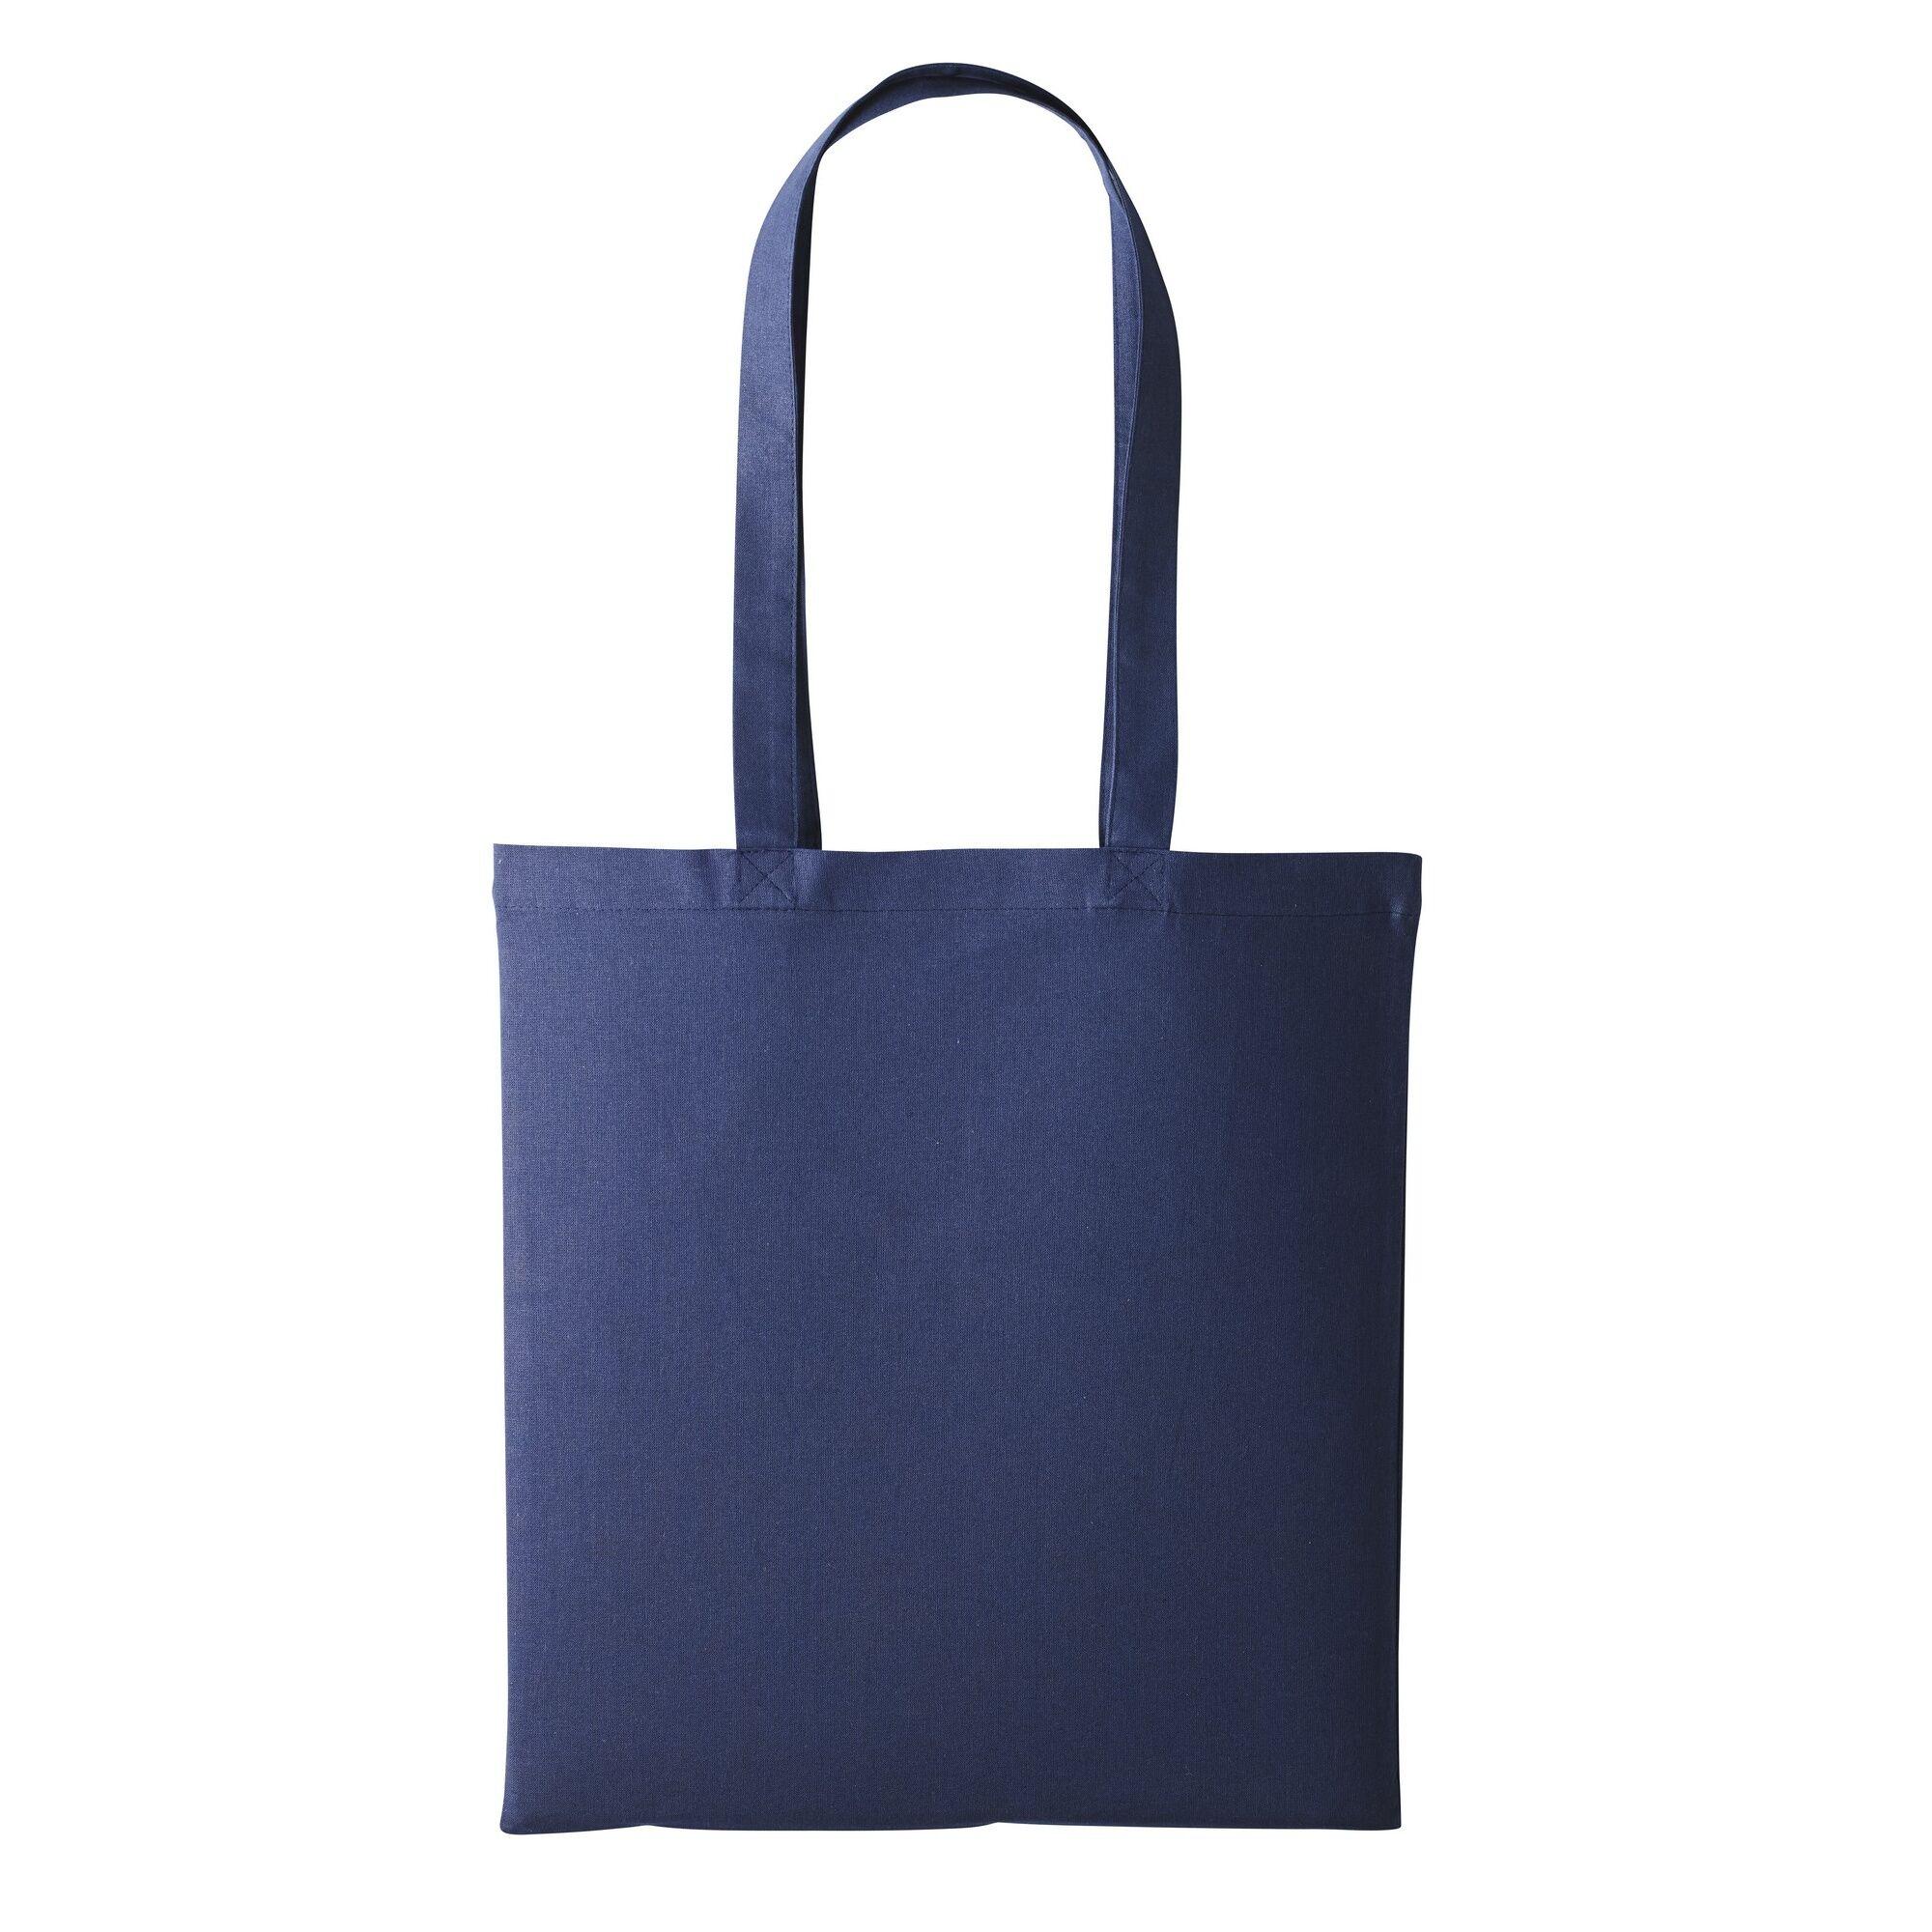 Sac De Coures (Bleu marine) - UTRW2137